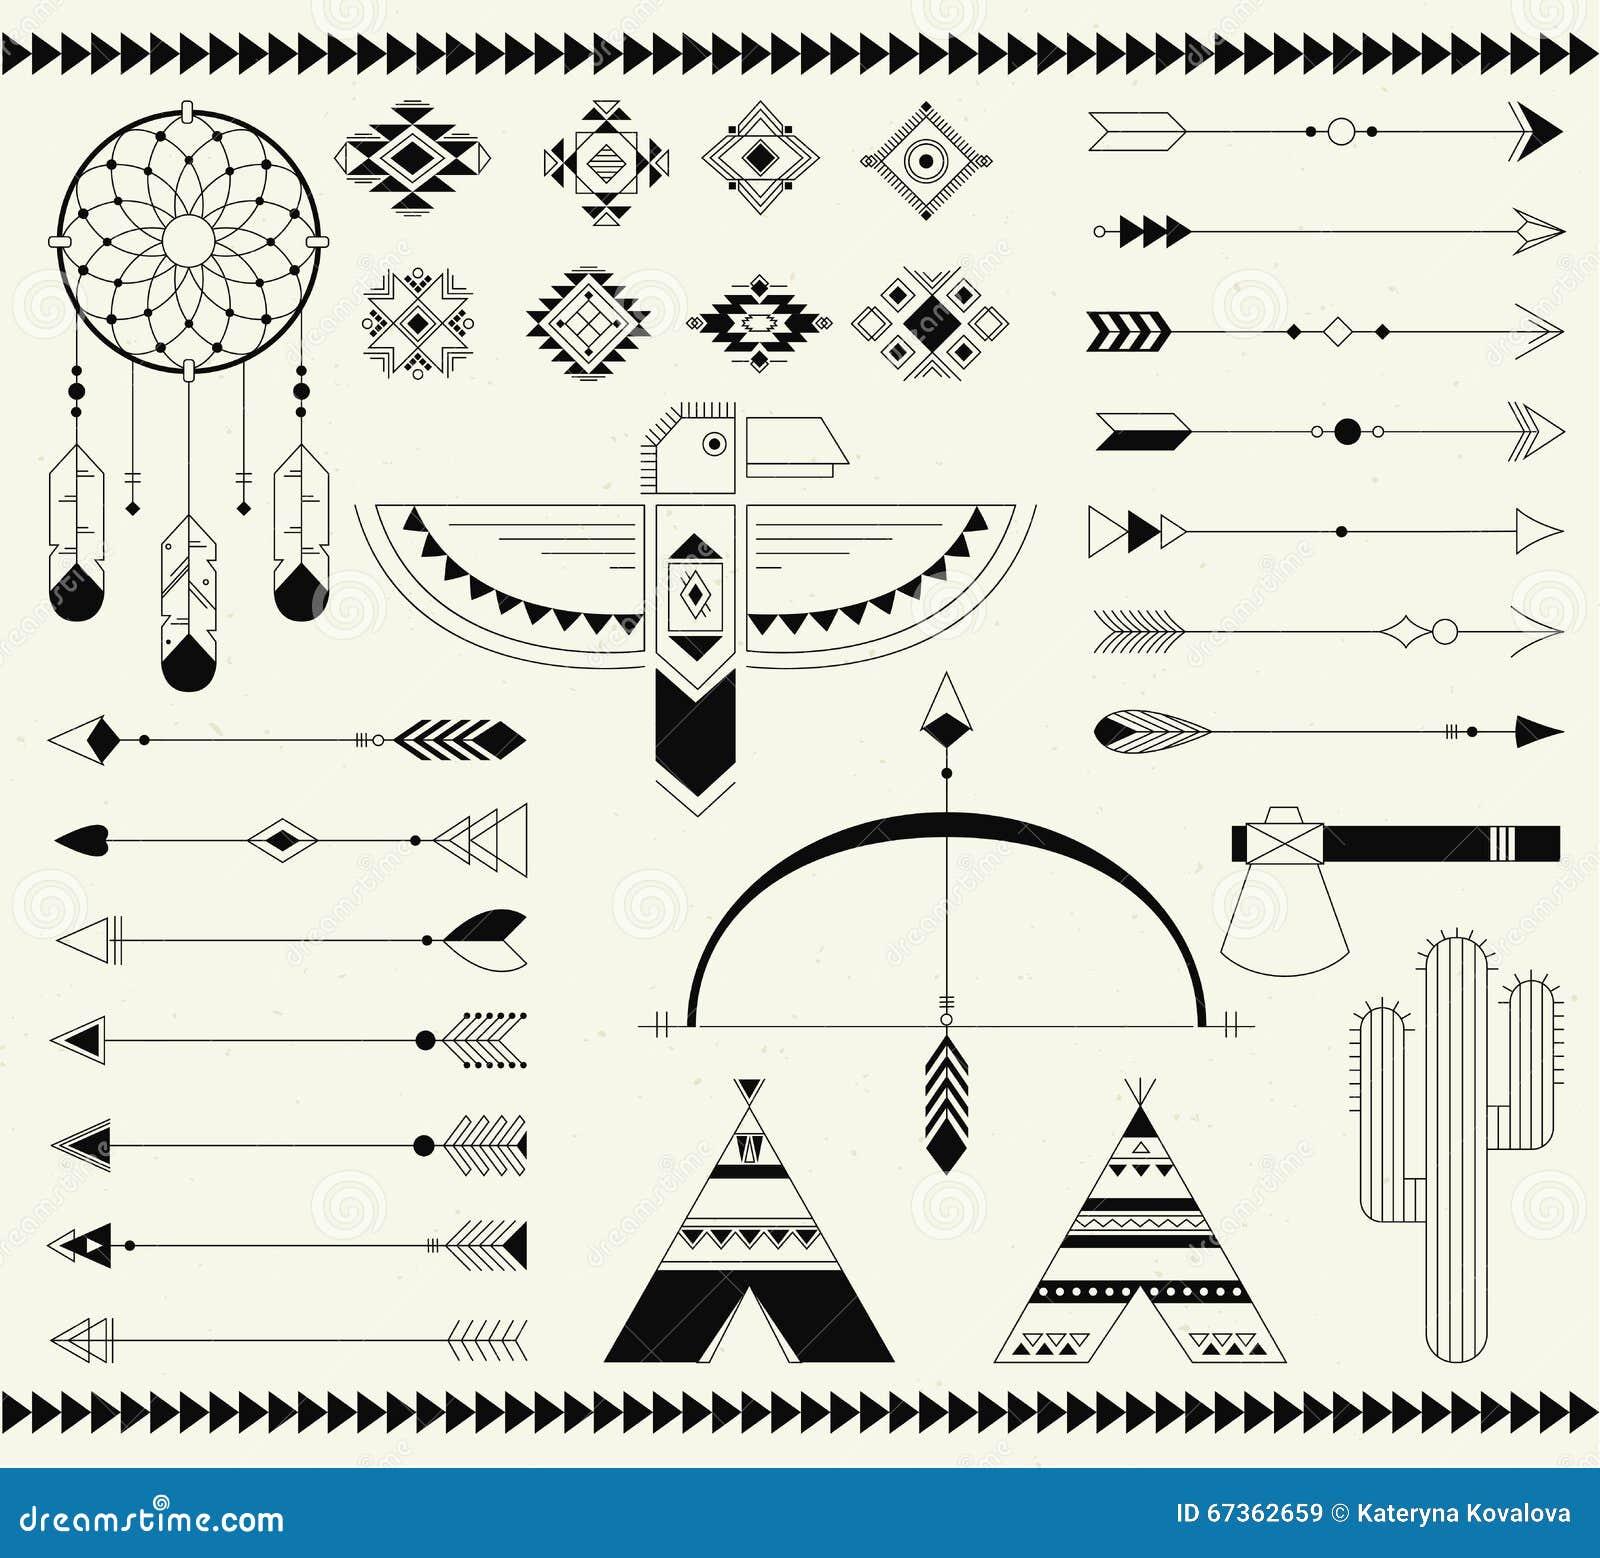 Thunderbird native american symbol stock illustrations 16 tribal native american indian element navajo american elements vector collection tribal print elements biocorpaavc Gallery